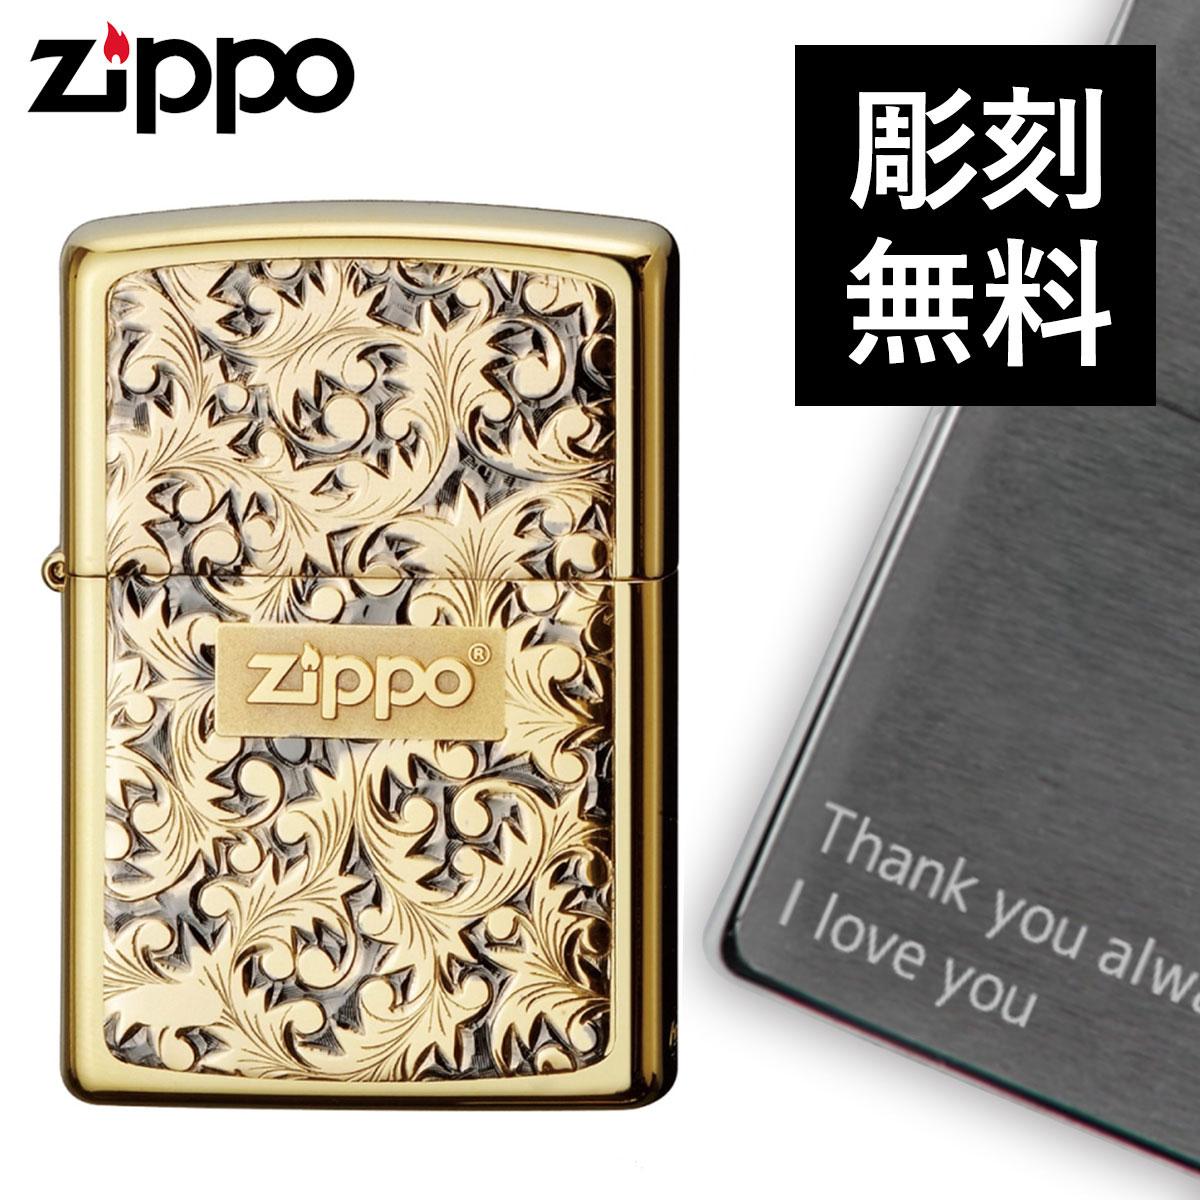 R e zakkaya rakuten global market names put for zippo name put names put for zippo name put zippo lighter titanium 200 gold titanium k 2 gift presents lighter zippo lighter titanium plated tastefully simple negle Gallery